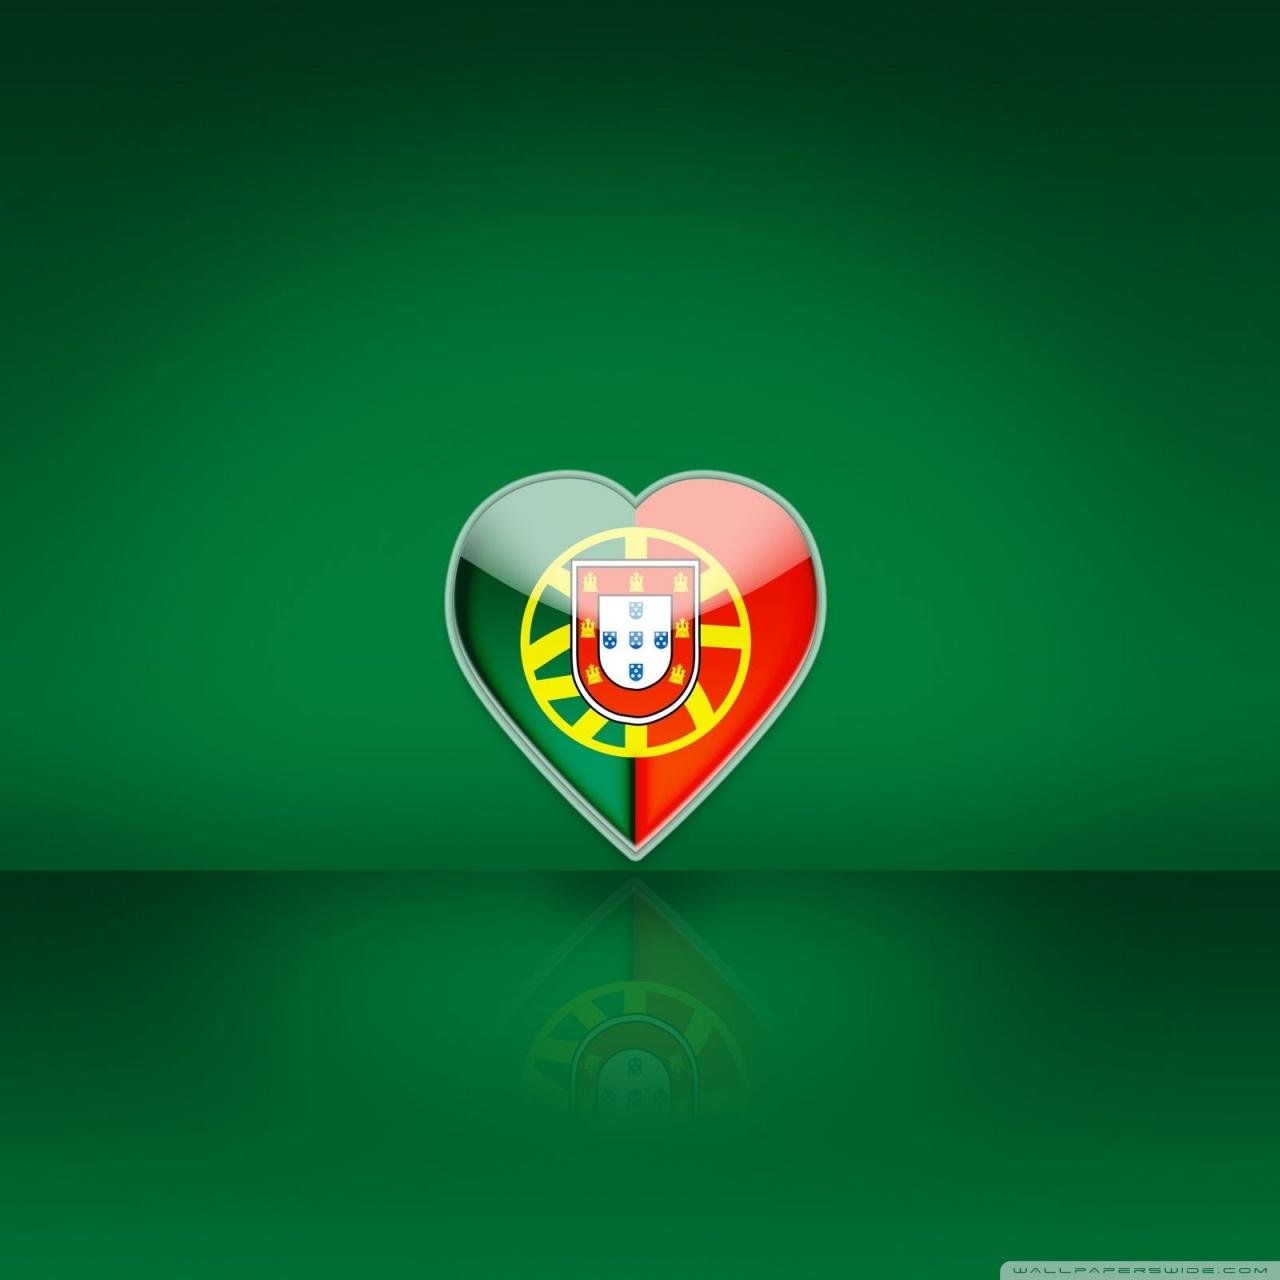 3d Wallpaper Apk Download Football Team Logo 4k Hd Desktop Wallpaper For 4k Ultra Hd